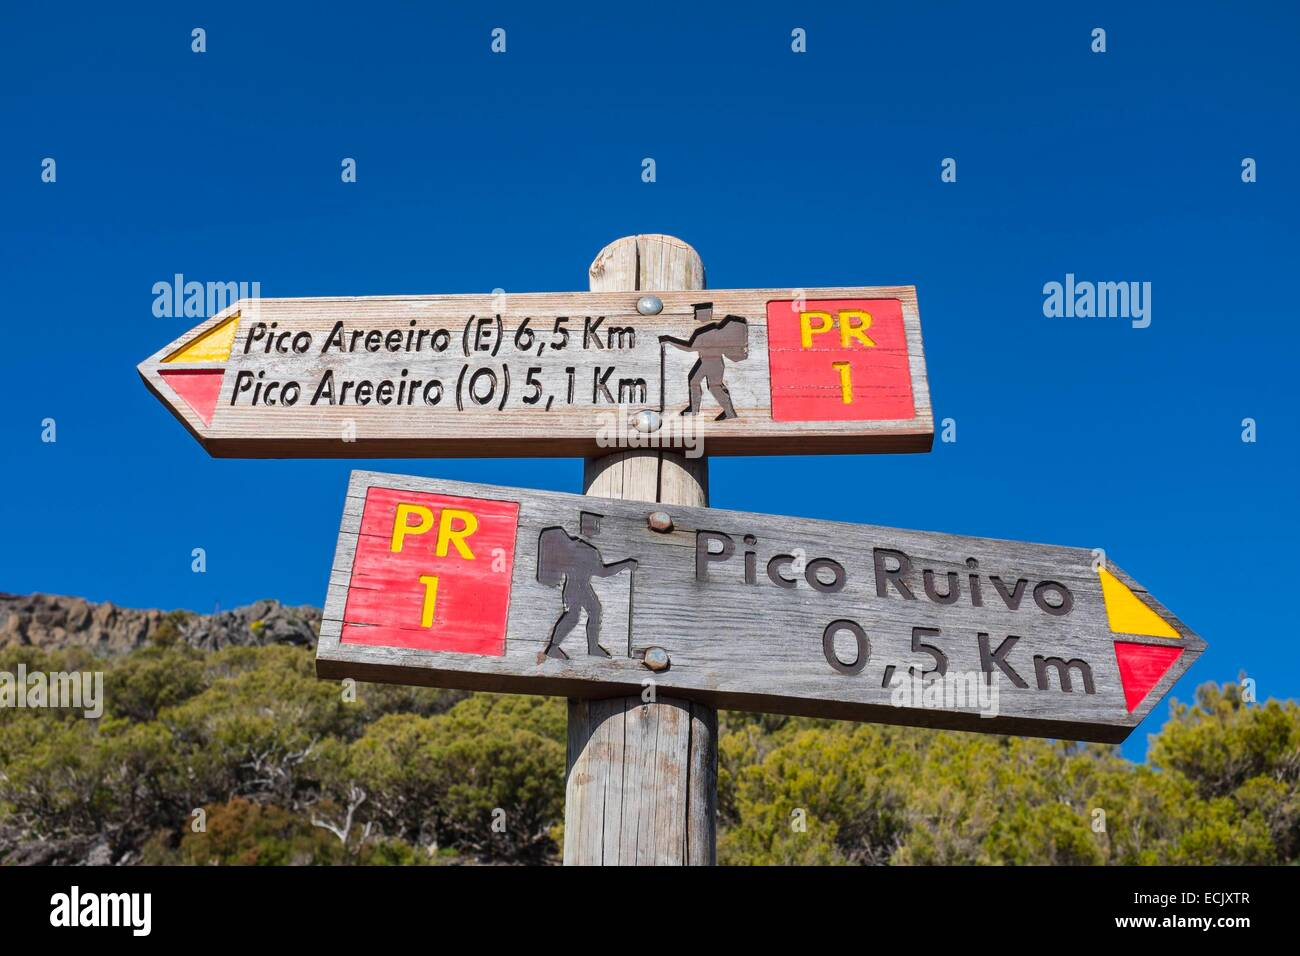 Le Portugal, l'île de Madère, randonnée entre Pico Ruivo et Pico do Arieiro Photo Stock